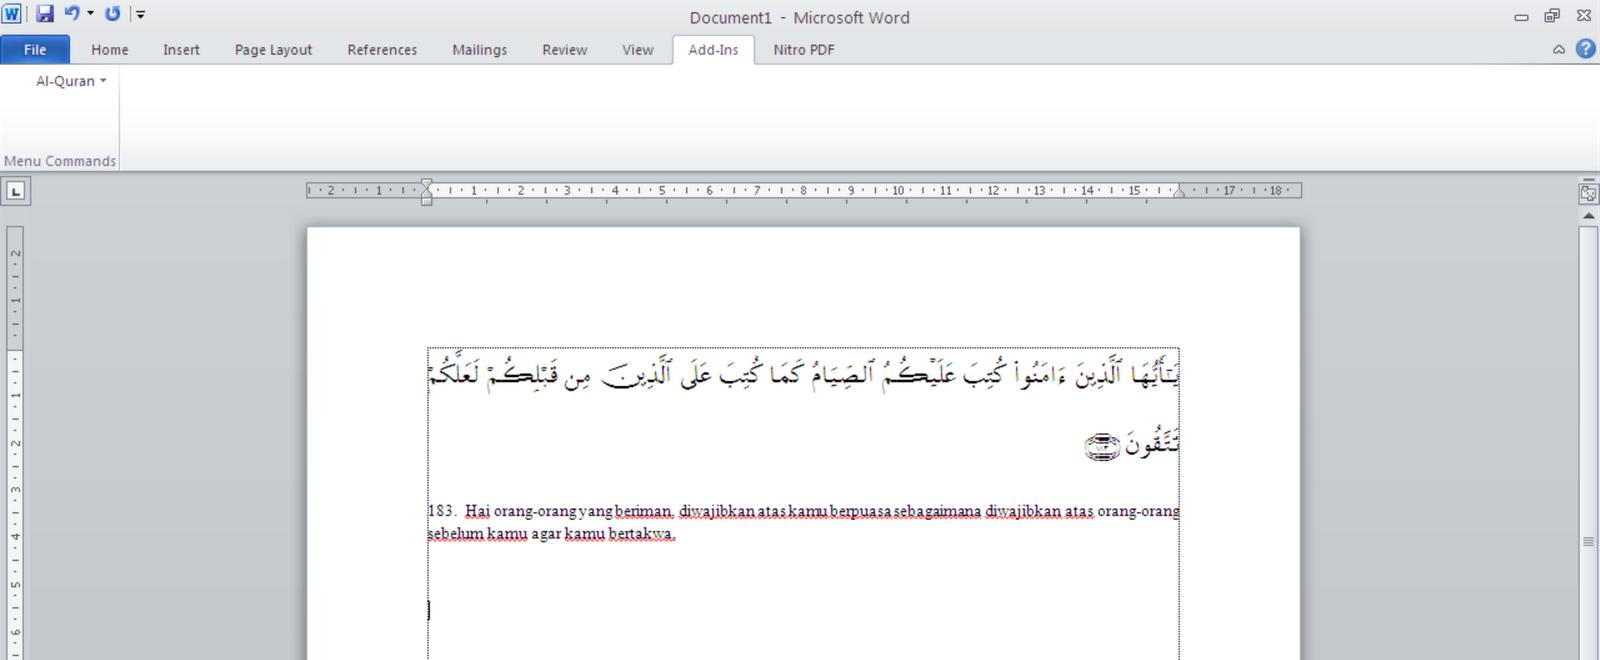 ThandonCamp Sumampir: Download & Install Add-Ins Al-Qur'an